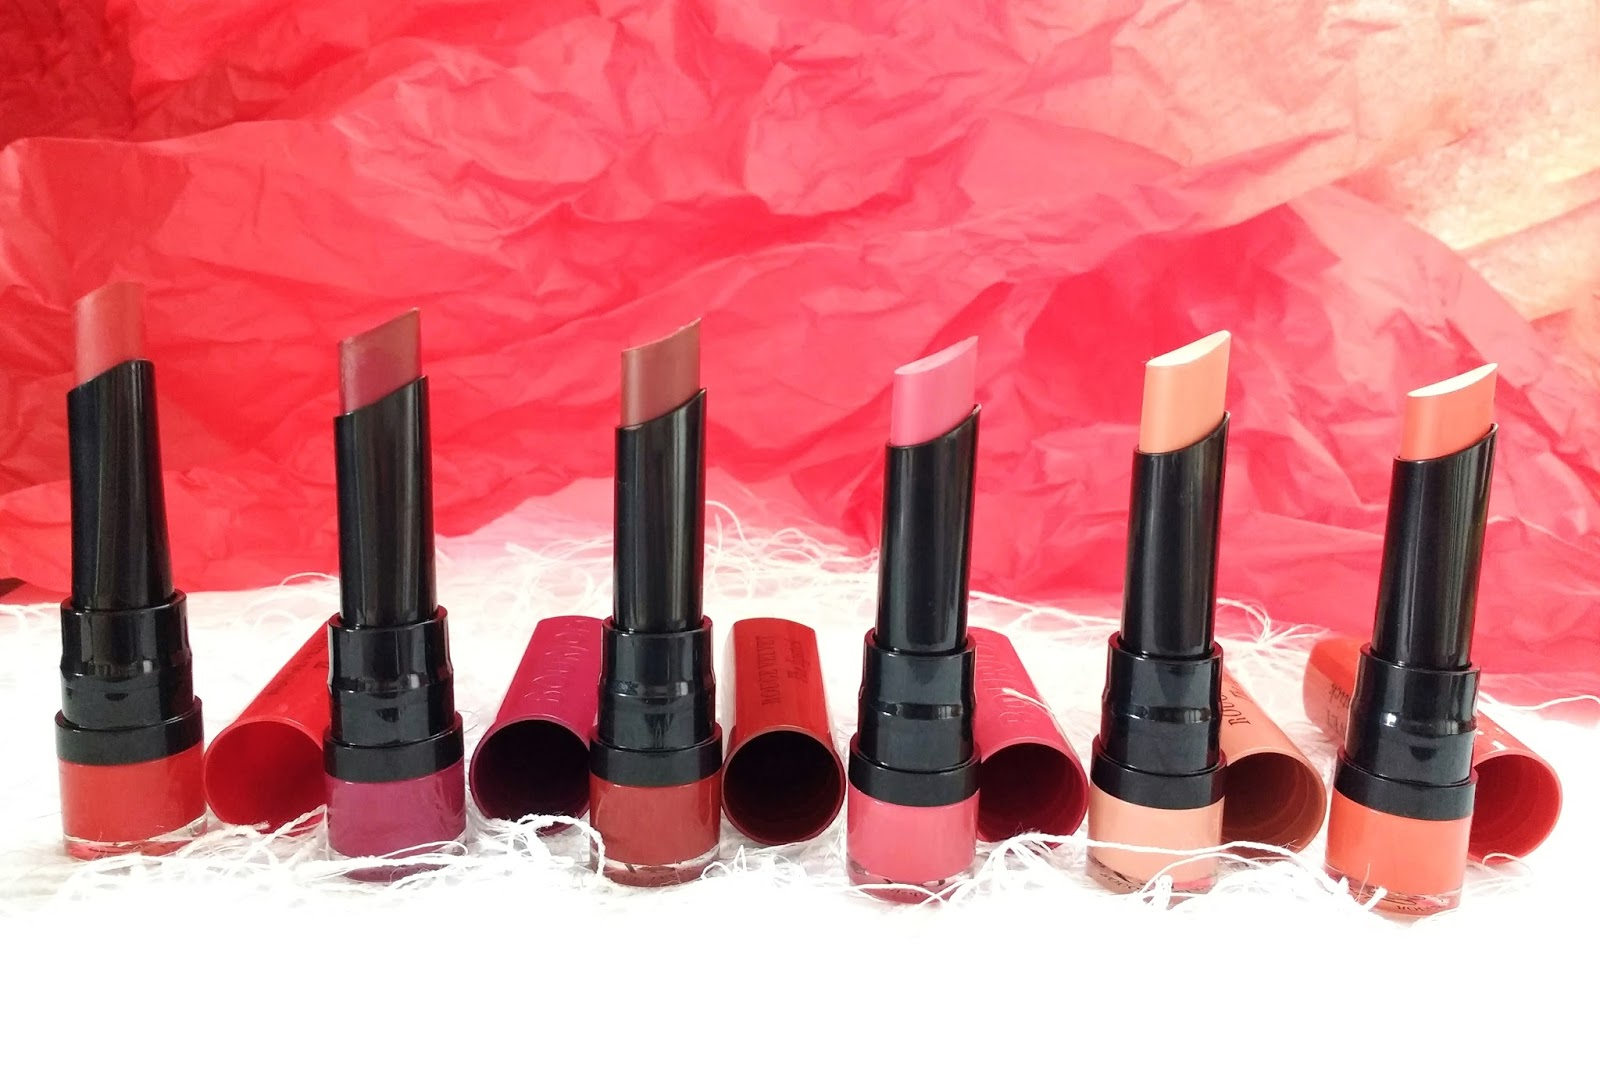 Bourjois Rouge Velvet Lipstick #VelvetTheLipstick | Matowe pomadki od Bourjois